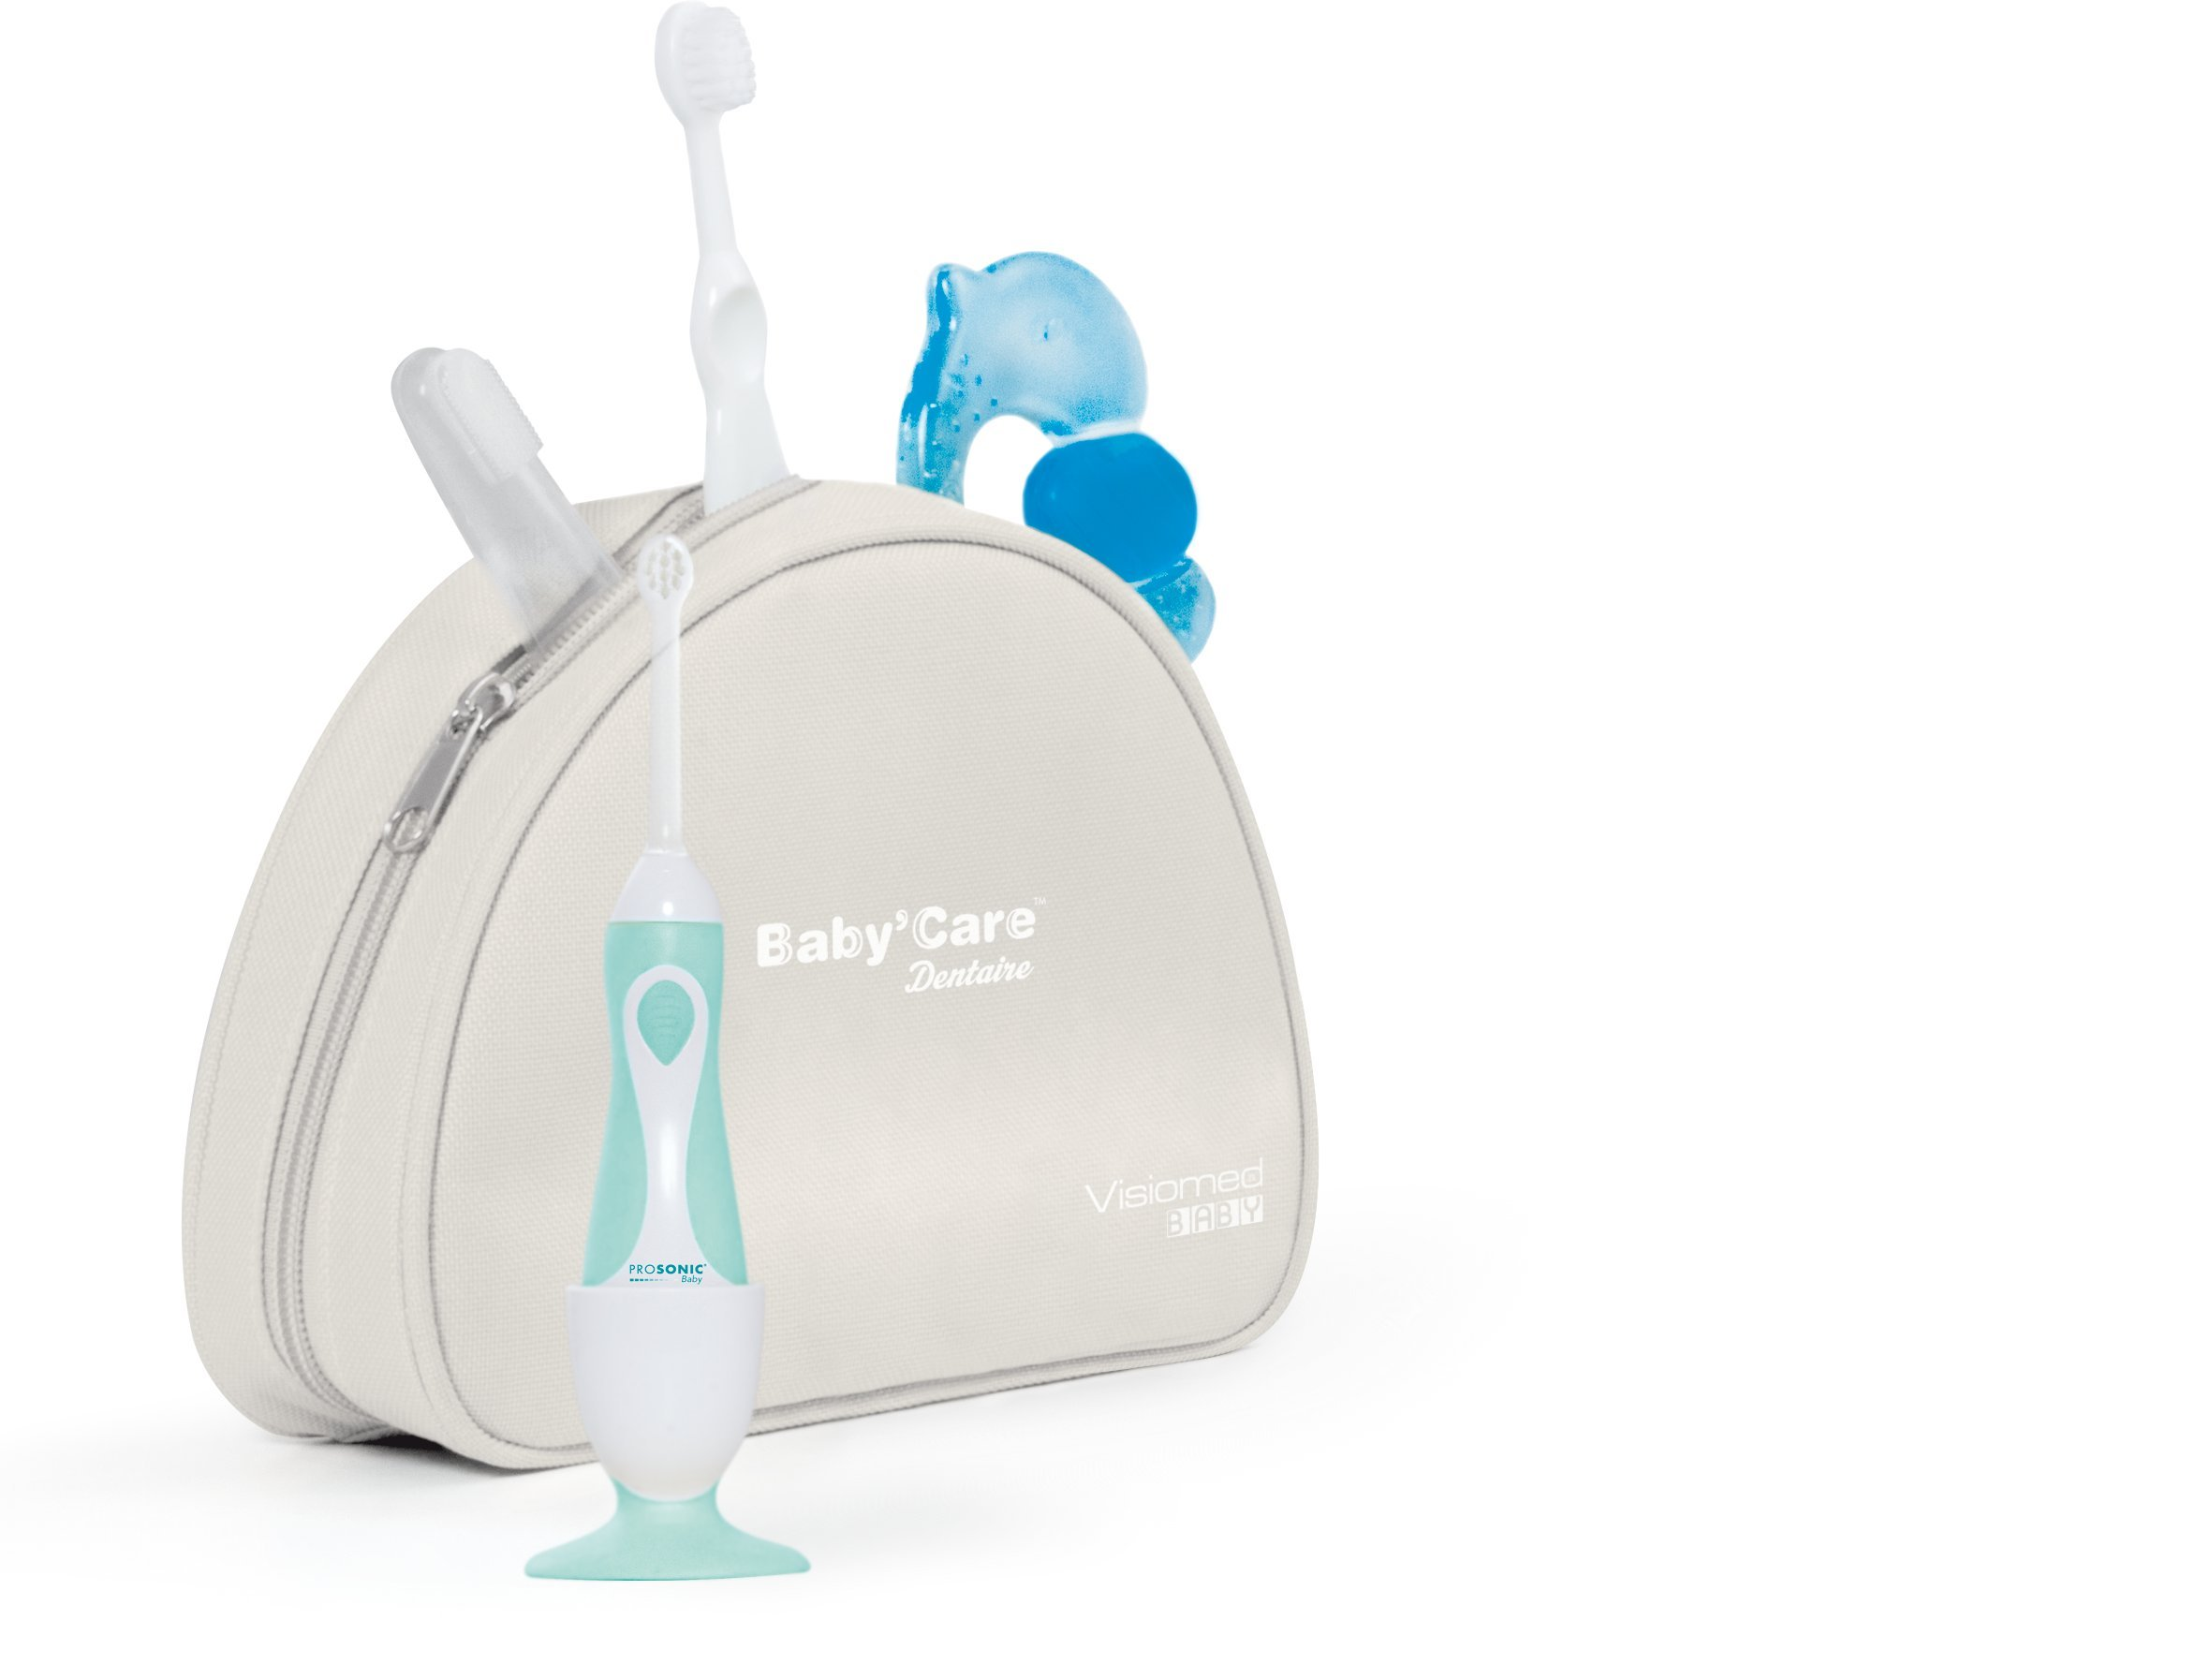 Visiomed Baby Care Dentaire Dental Care Kit